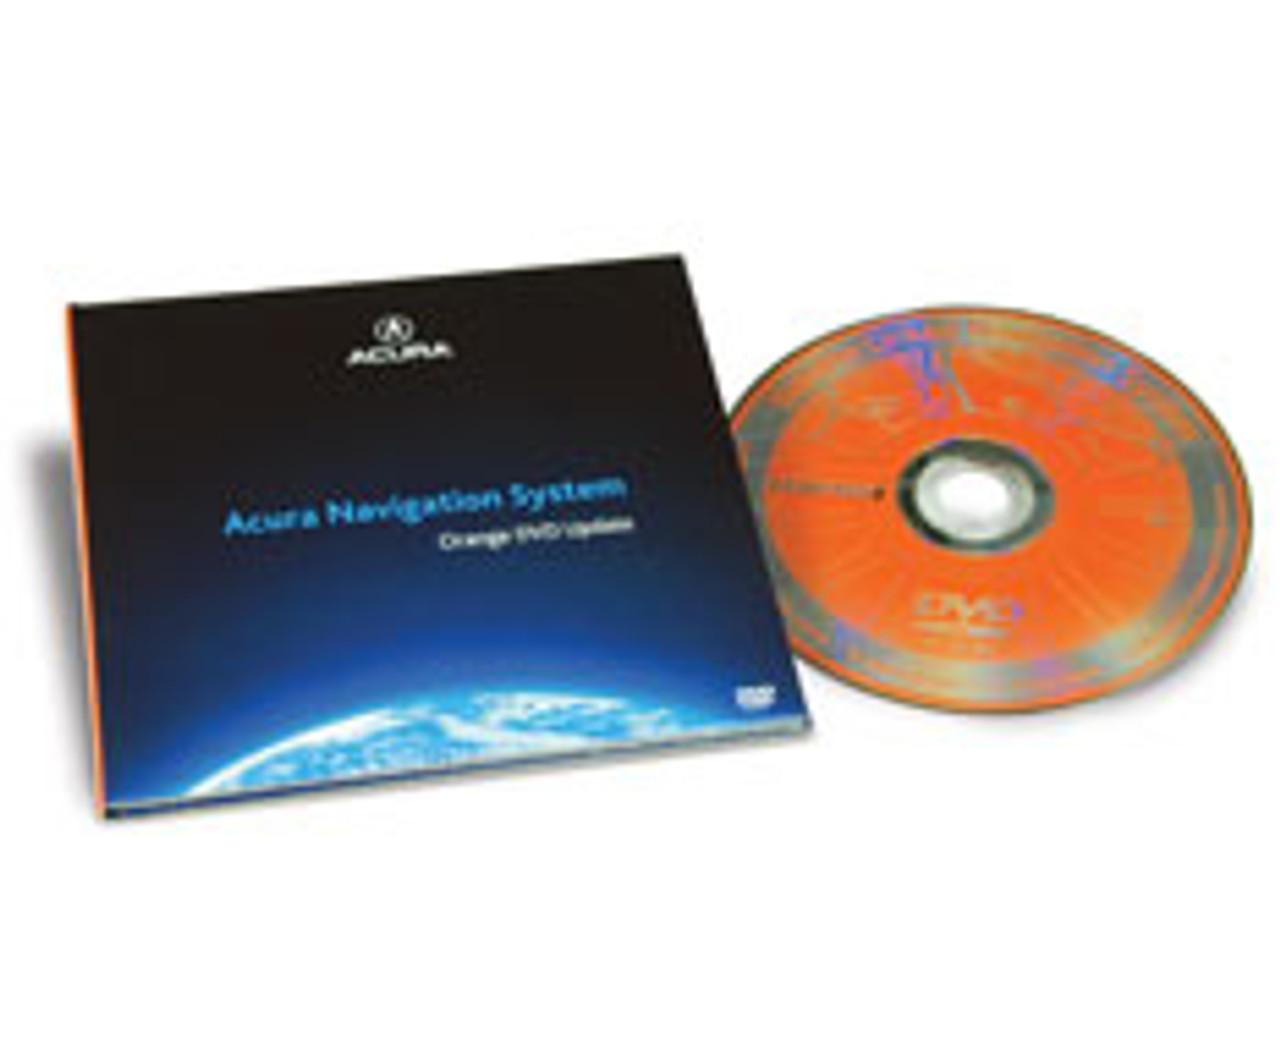 Acura TL TSX MDX RL Honda ACCORD Navigation Disc Disk 3 D0 Orange GPS  Satellite 2014 Nav Maps 03 04 05 06